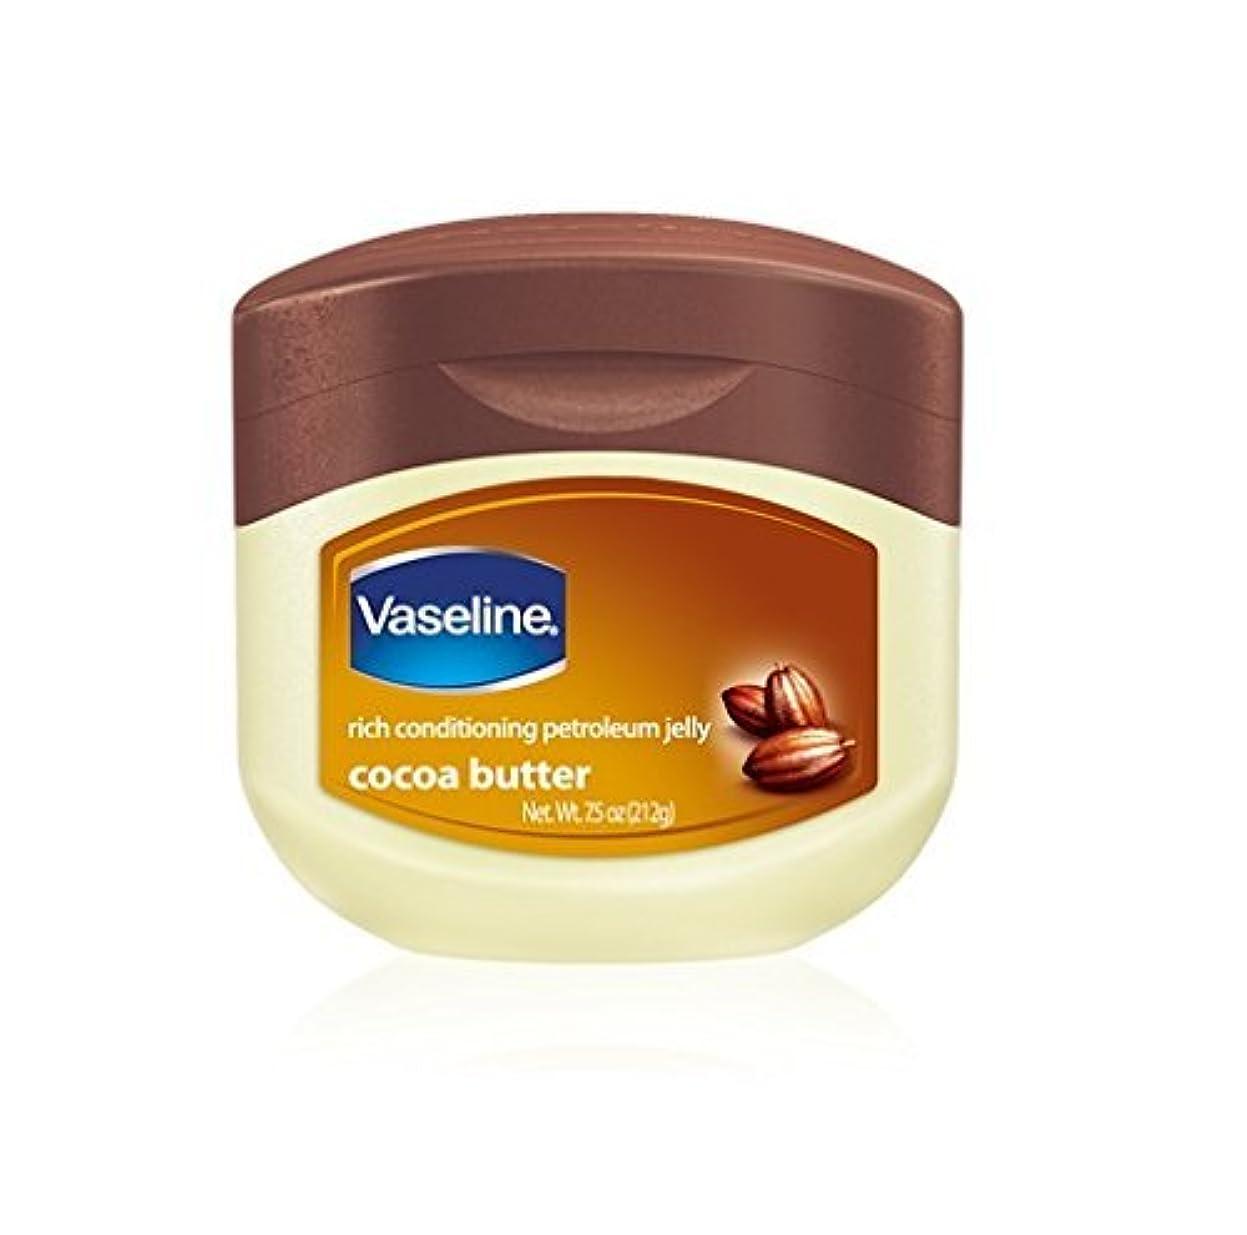 Vaseline Jelly Cocoa Butter for_dry_skin 220 ml [並行輸入品]